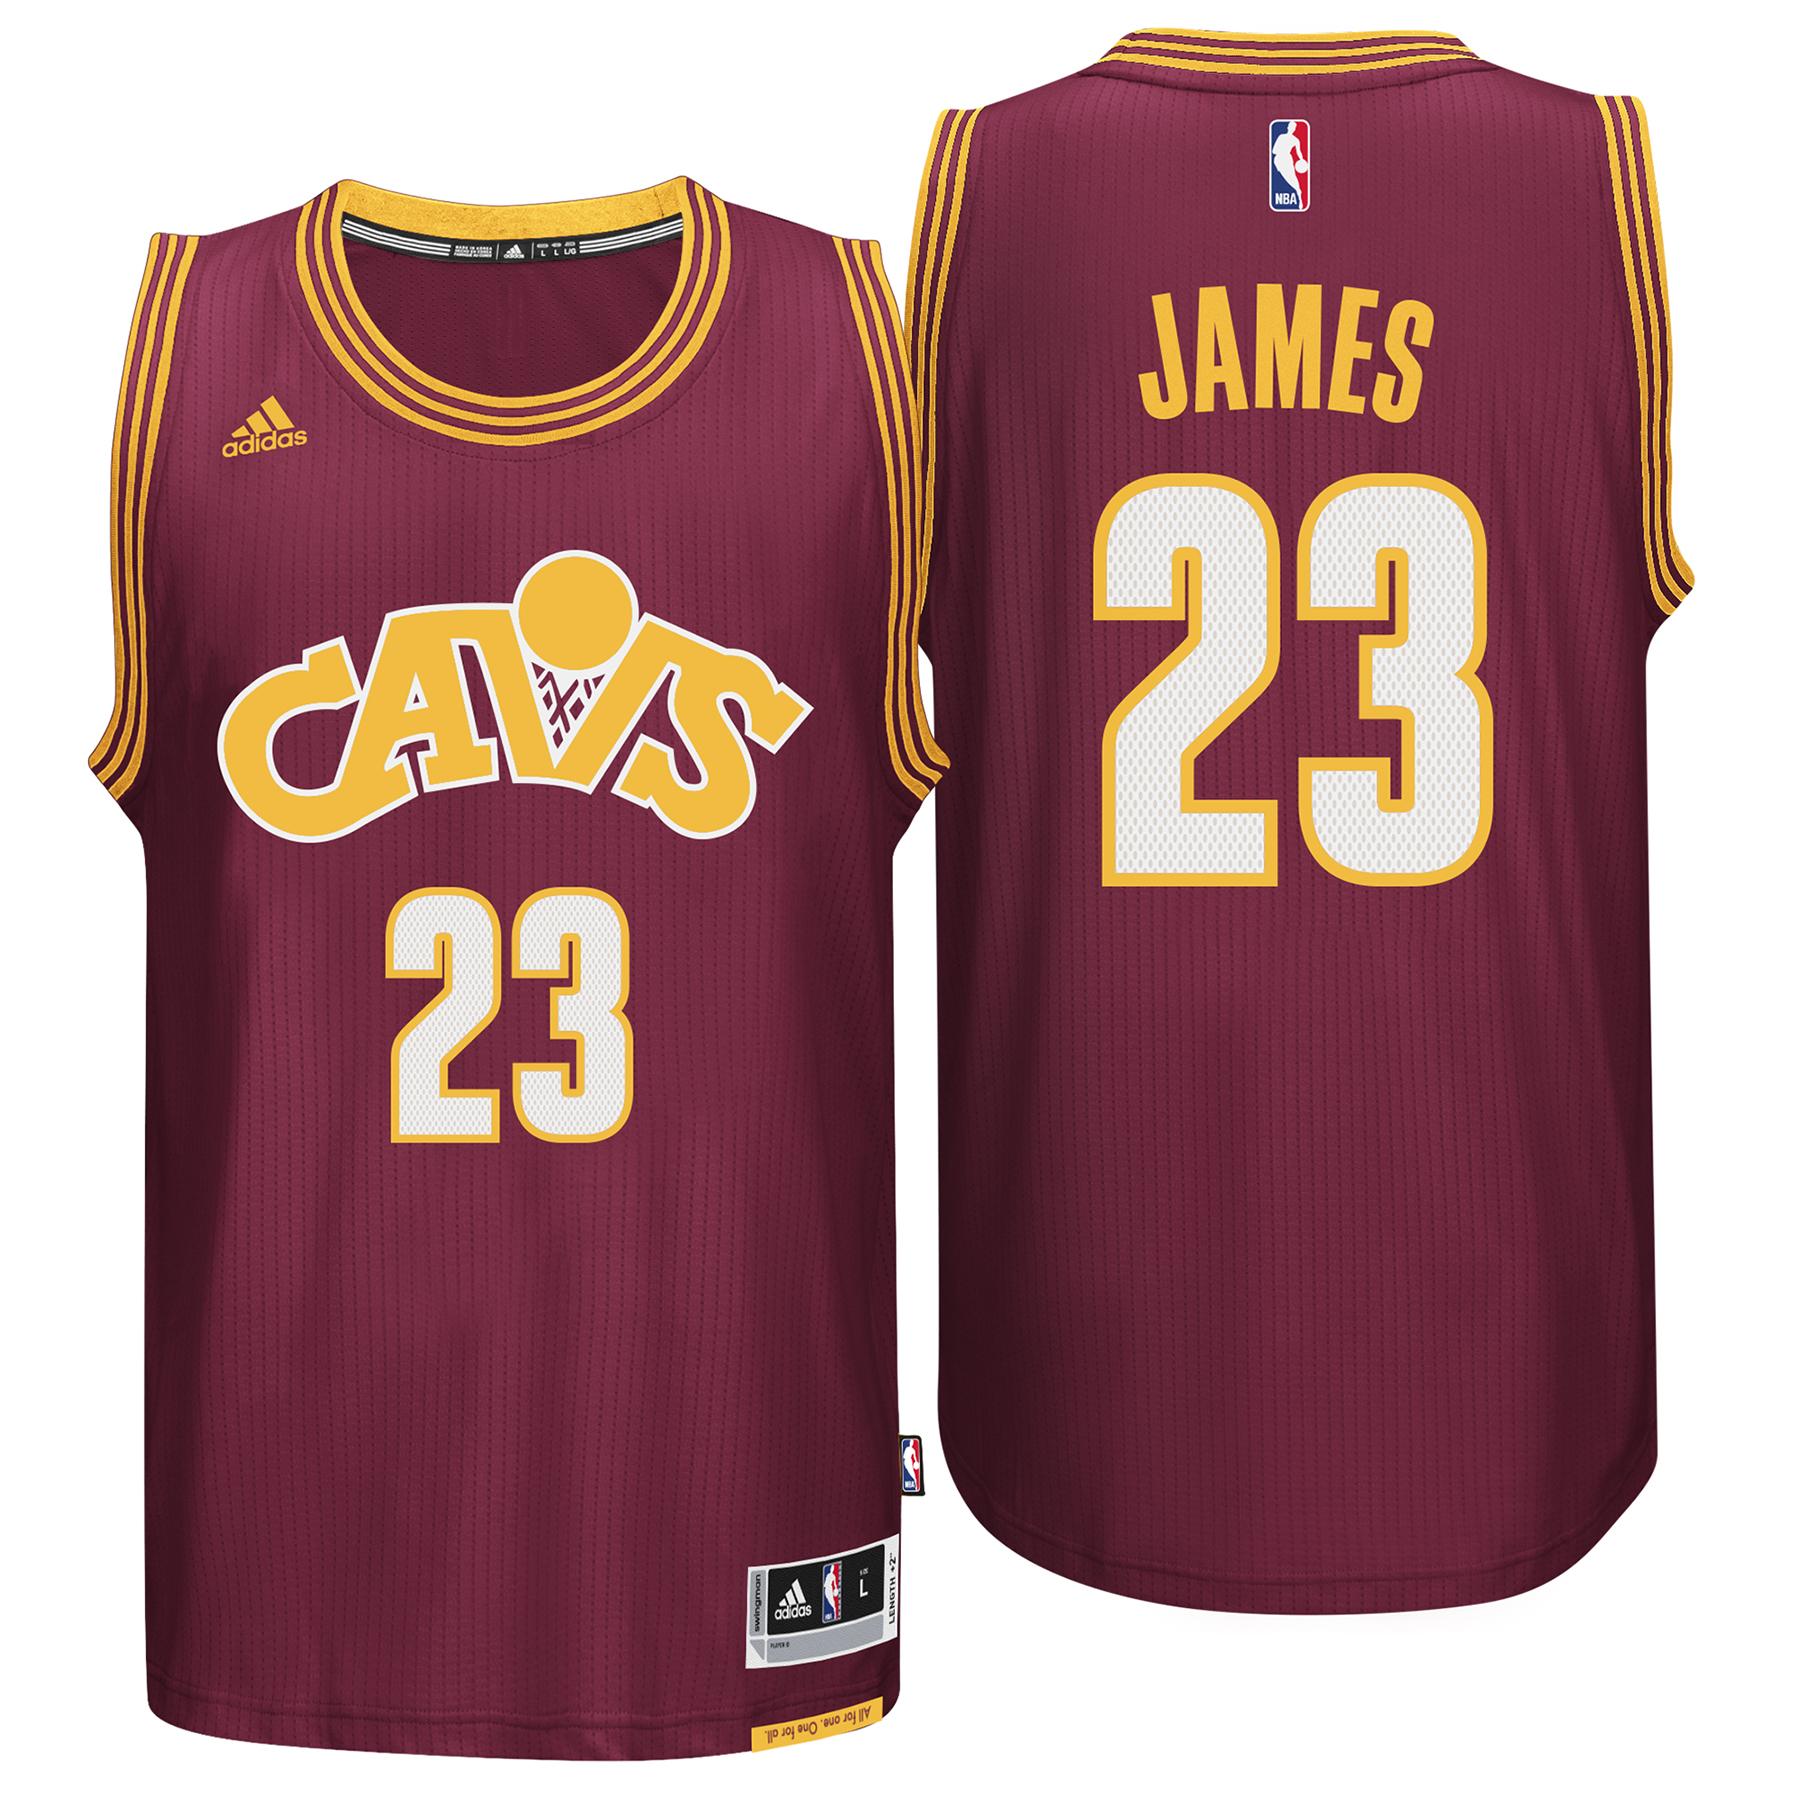 Cleveland Cavaliers Road Stretch Swingman Jersey - Lebron James - Mens